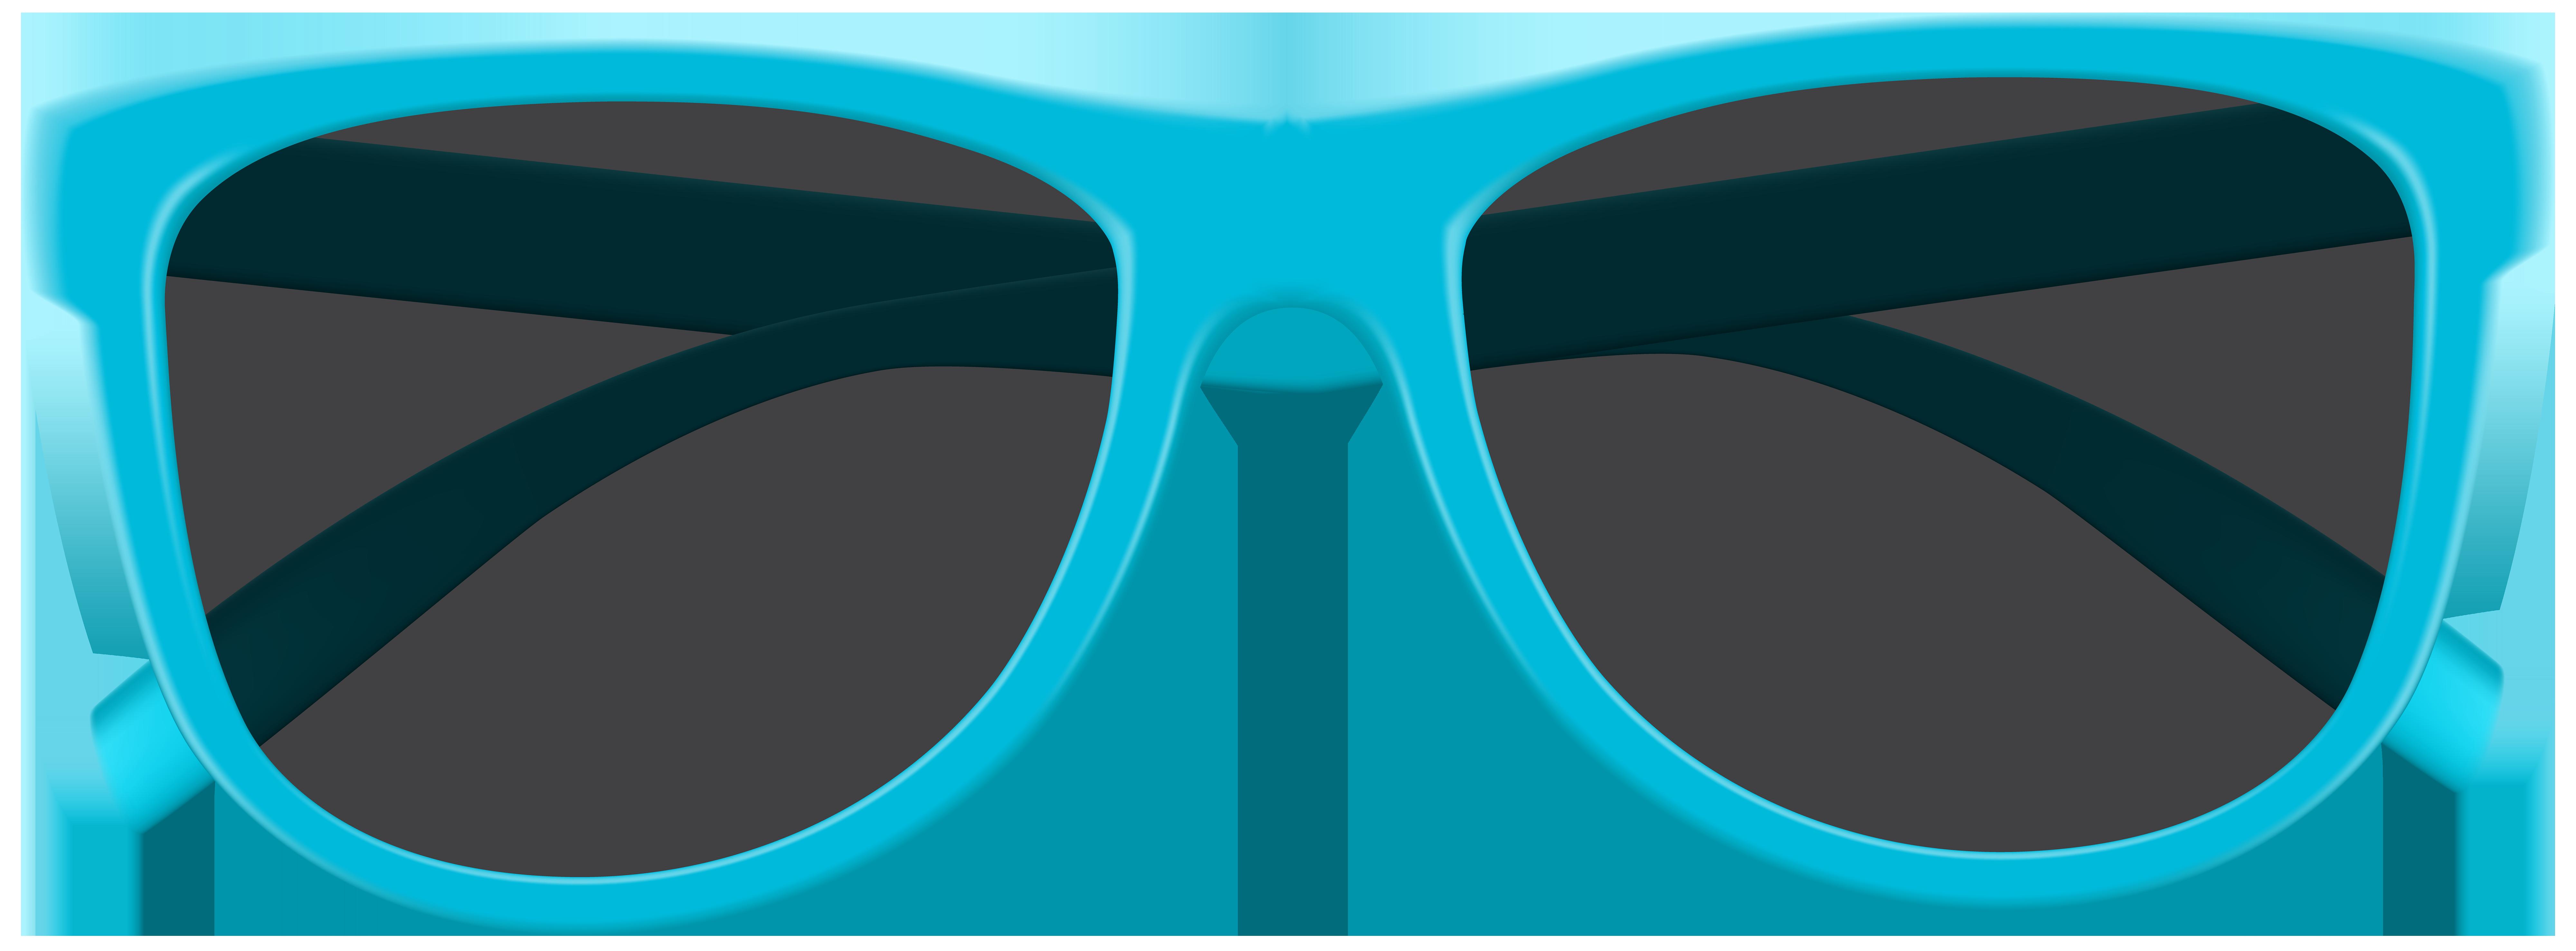 Blue Sunglasses PNG Clip Art Image.